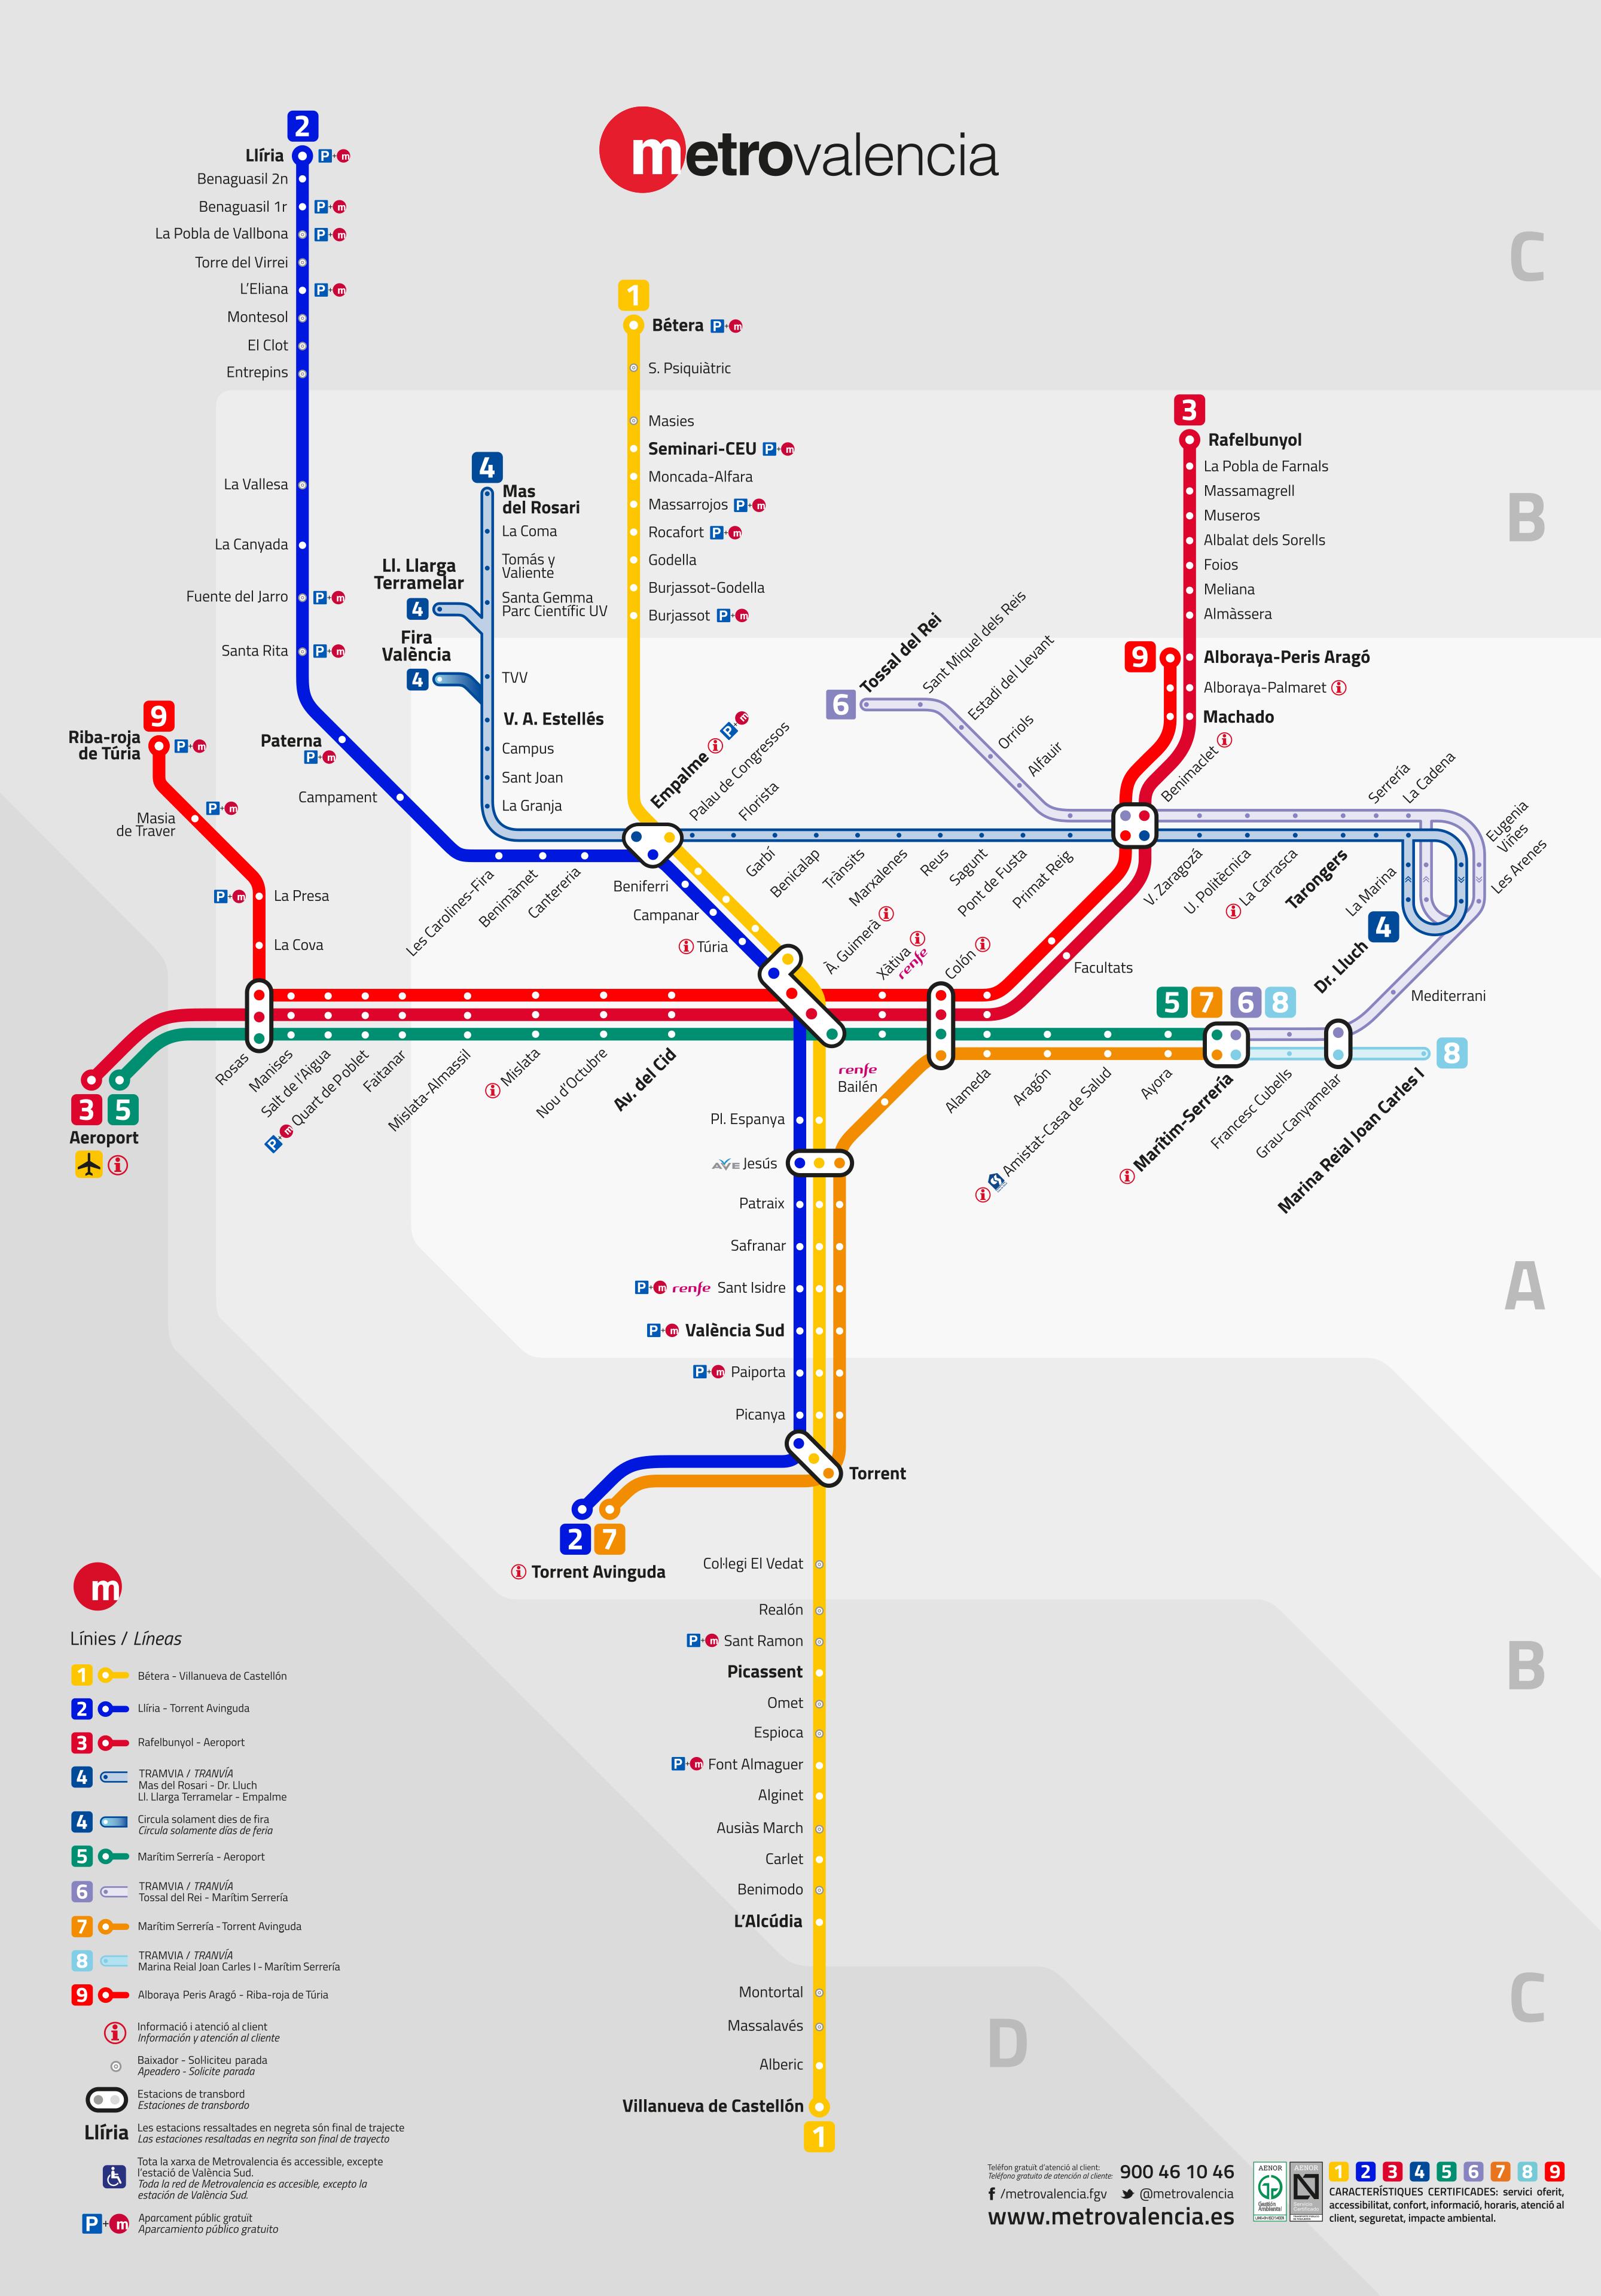 mapa do metro de valencia espanha Valencia metro map, Spain mapa do metro de valencia espanha